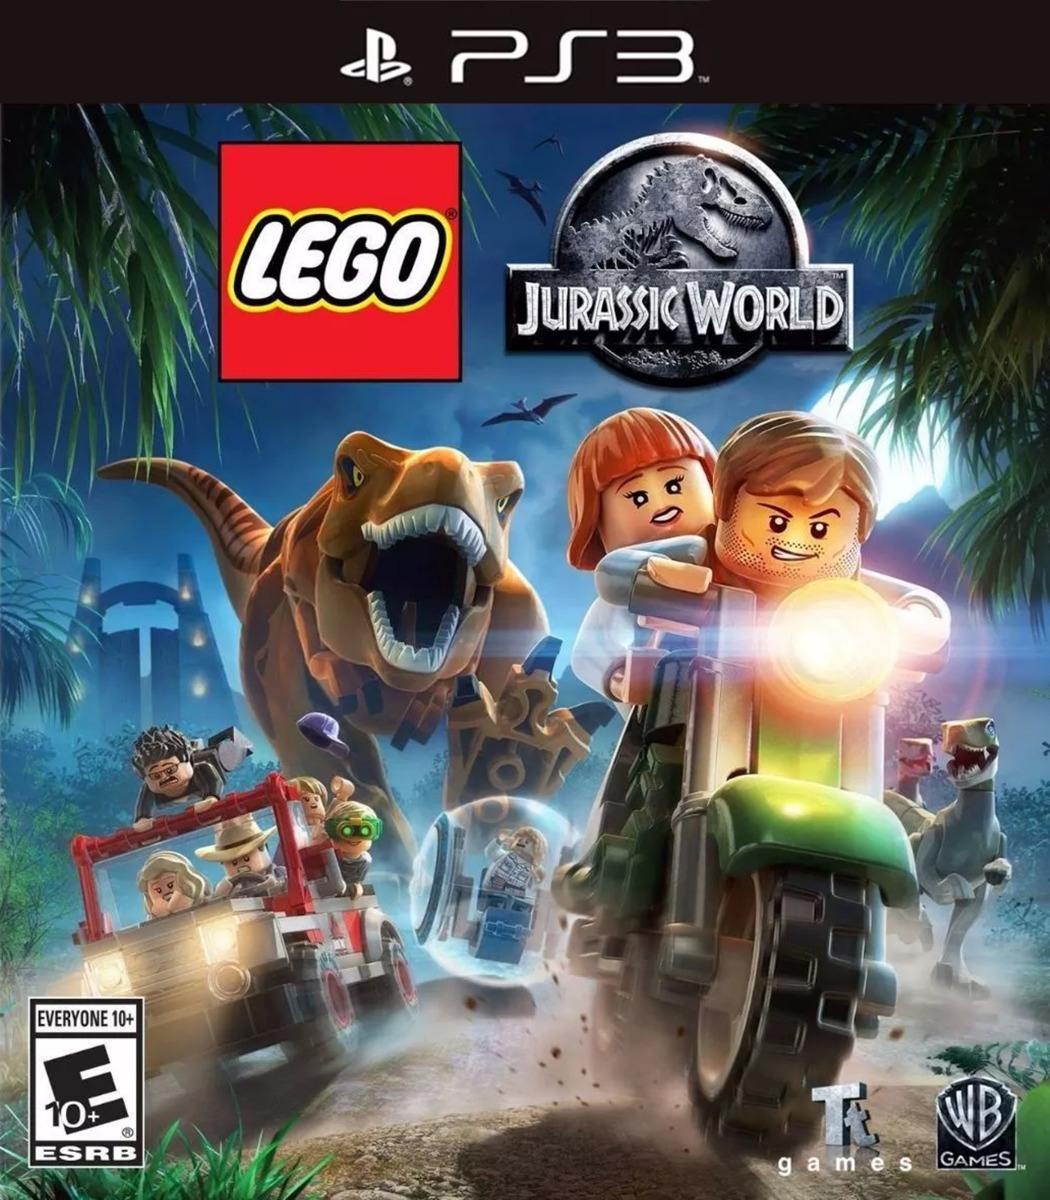 LEGO JURASSIC WORLD SEMINUEVO